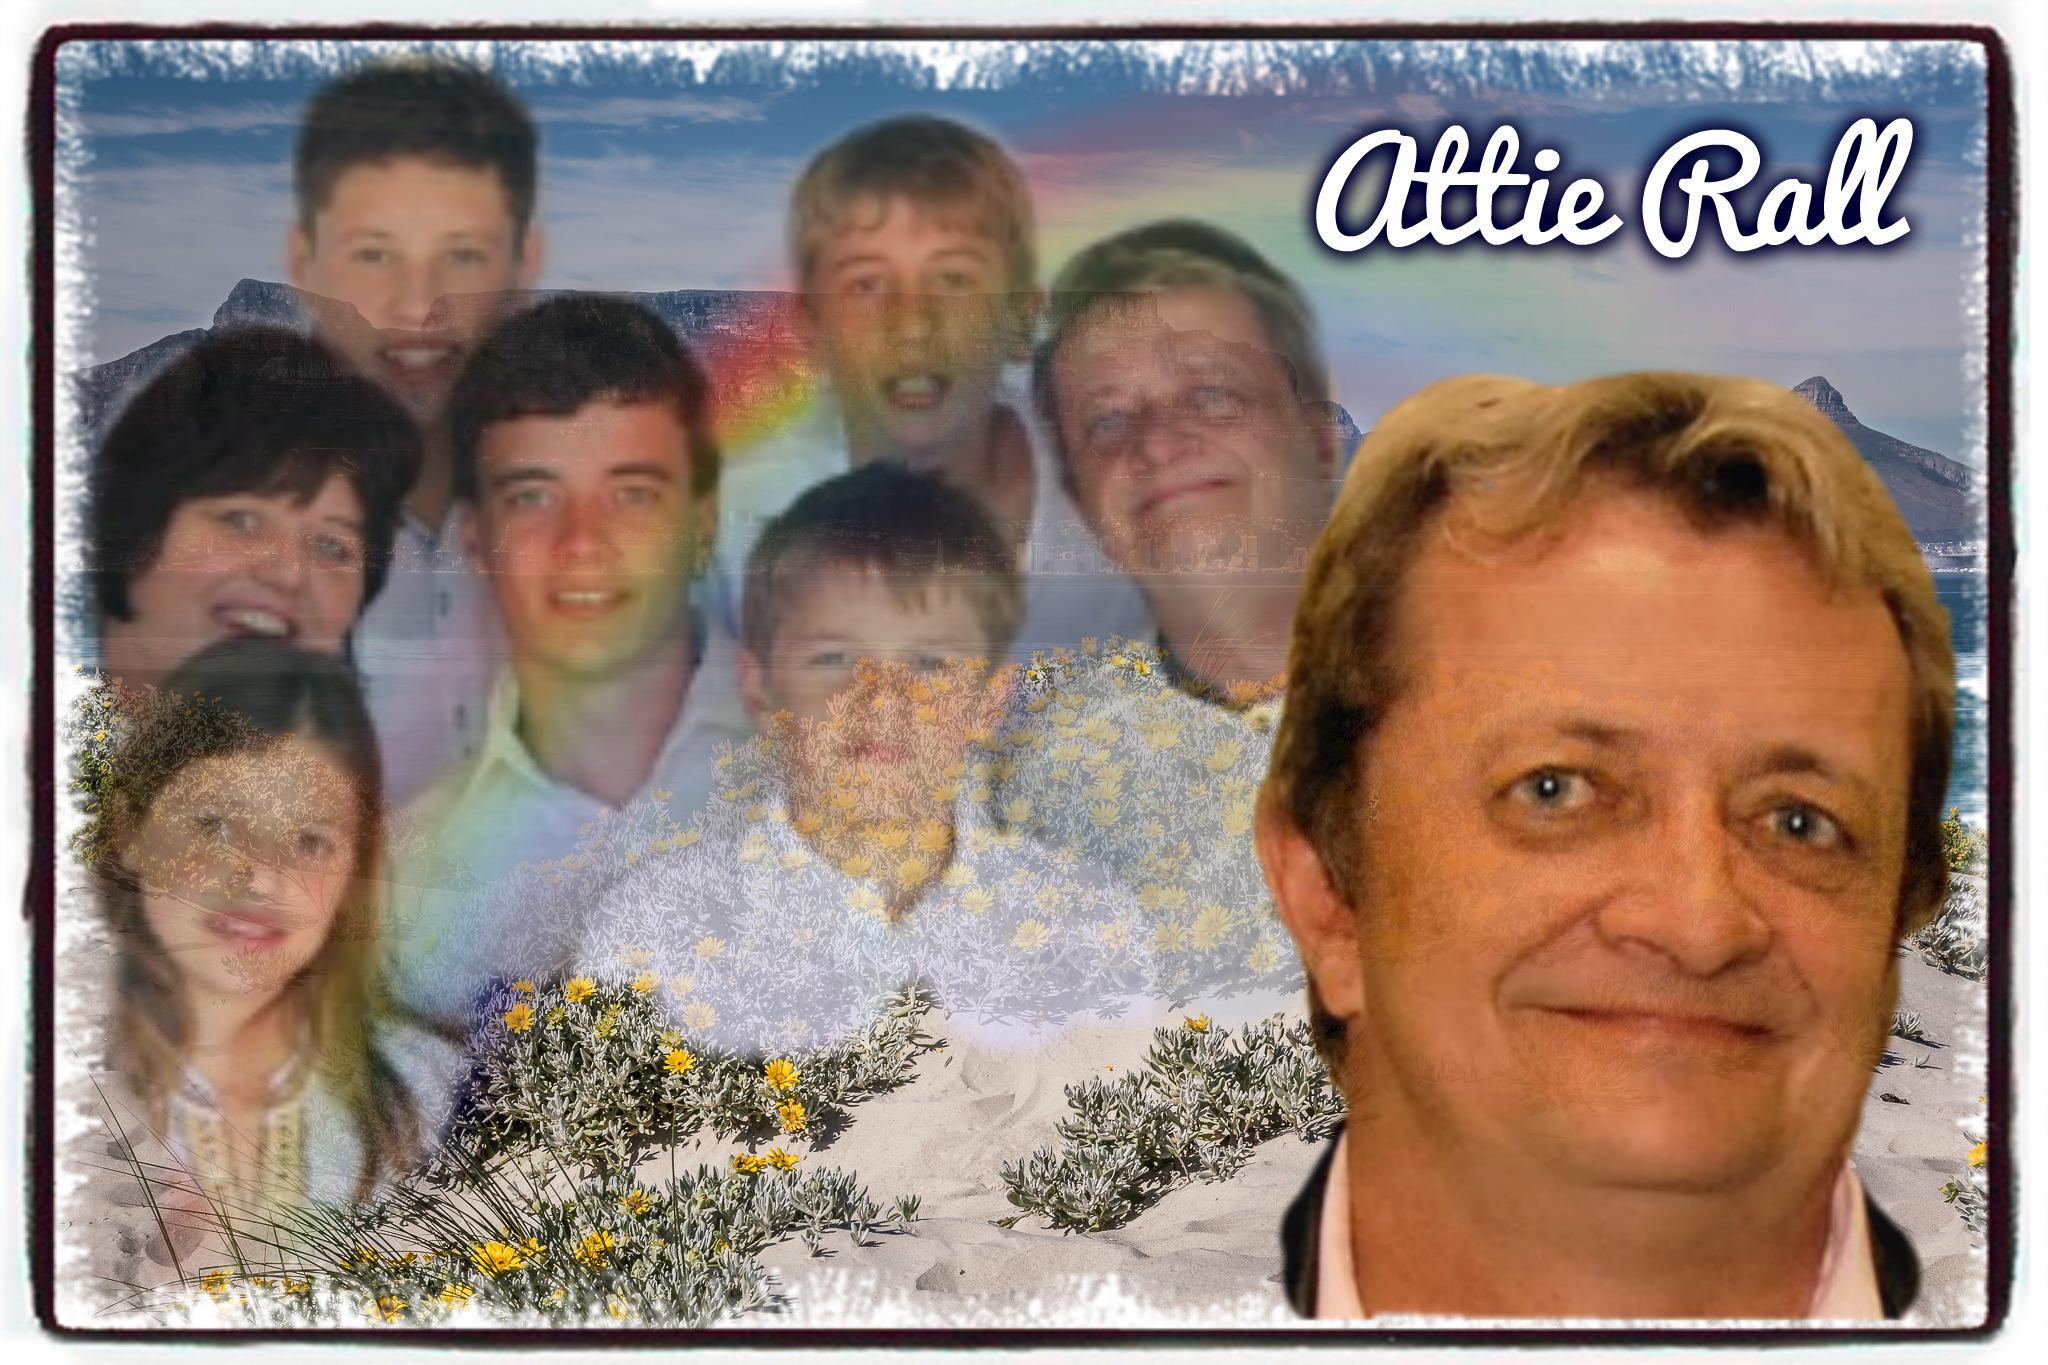 Attie Rall